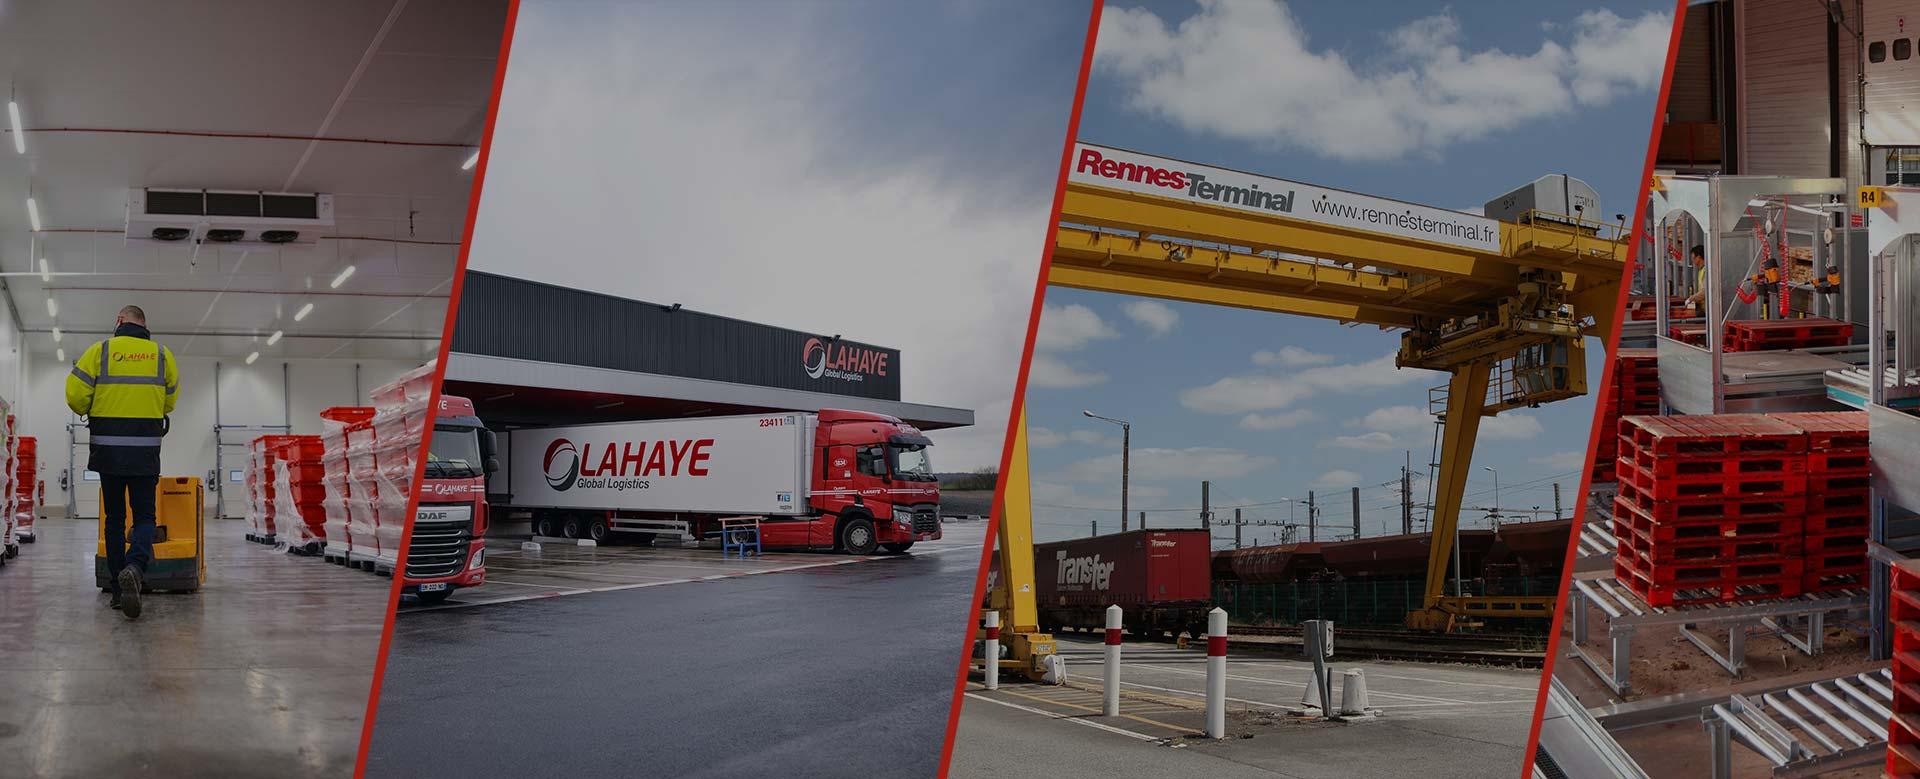 Lahaye Global Logistics Logistique Nos Metiers Header